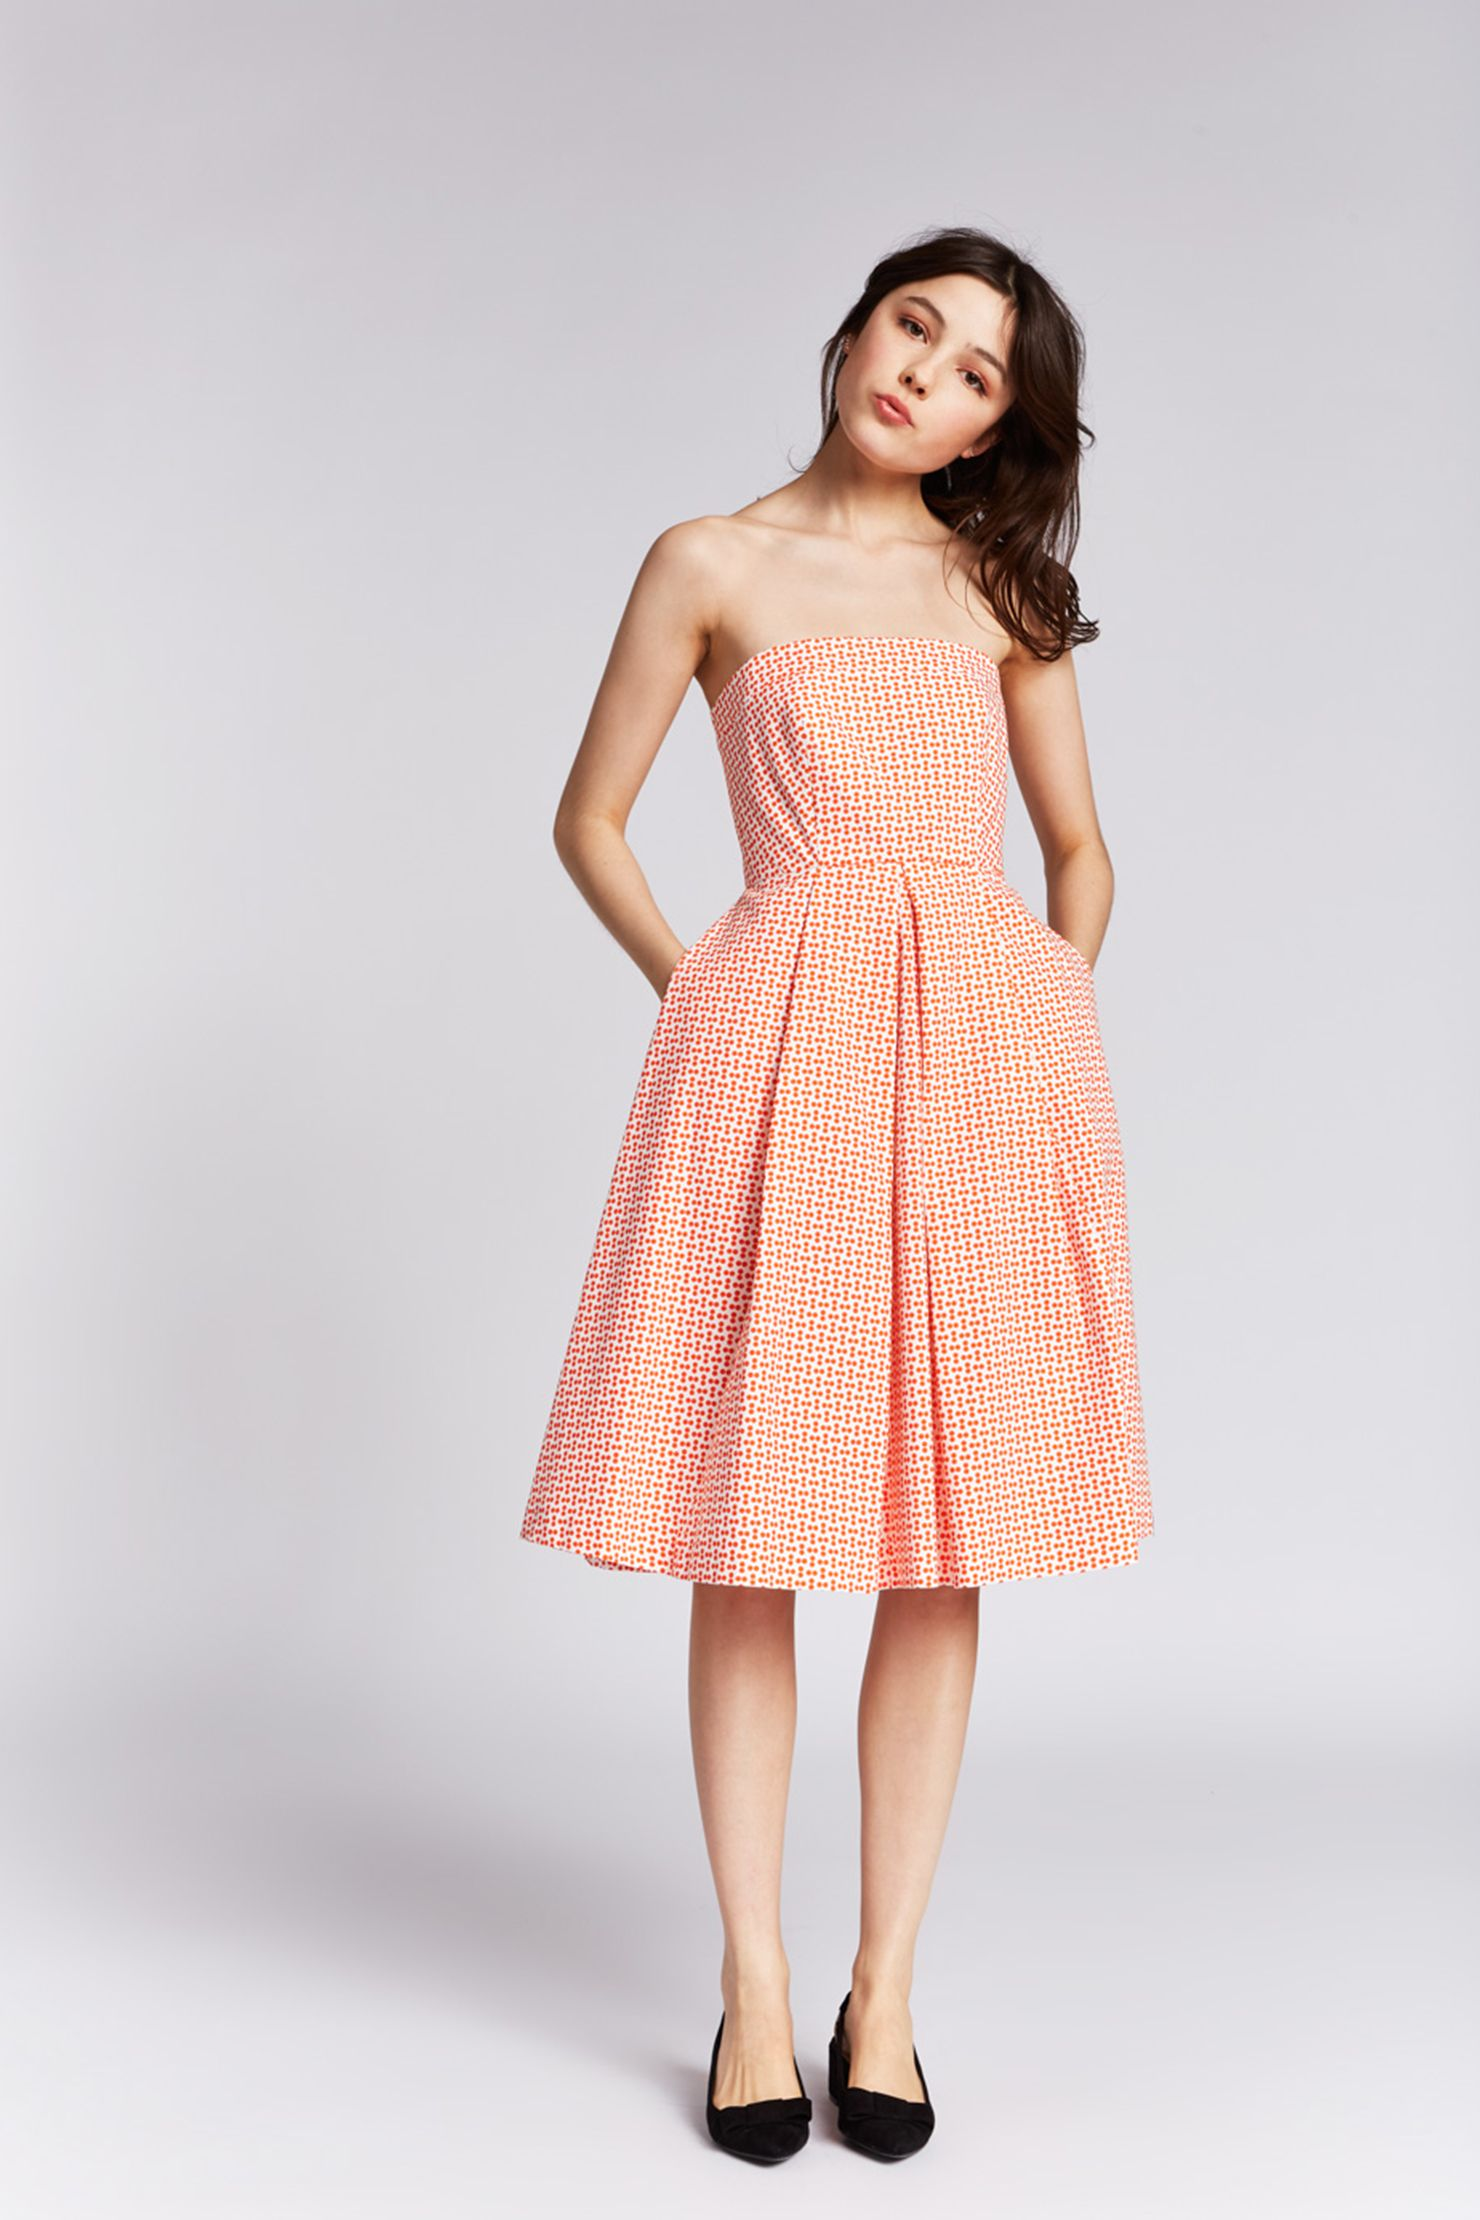 Mid-length dresse - 16411-r3763 - Print zoom